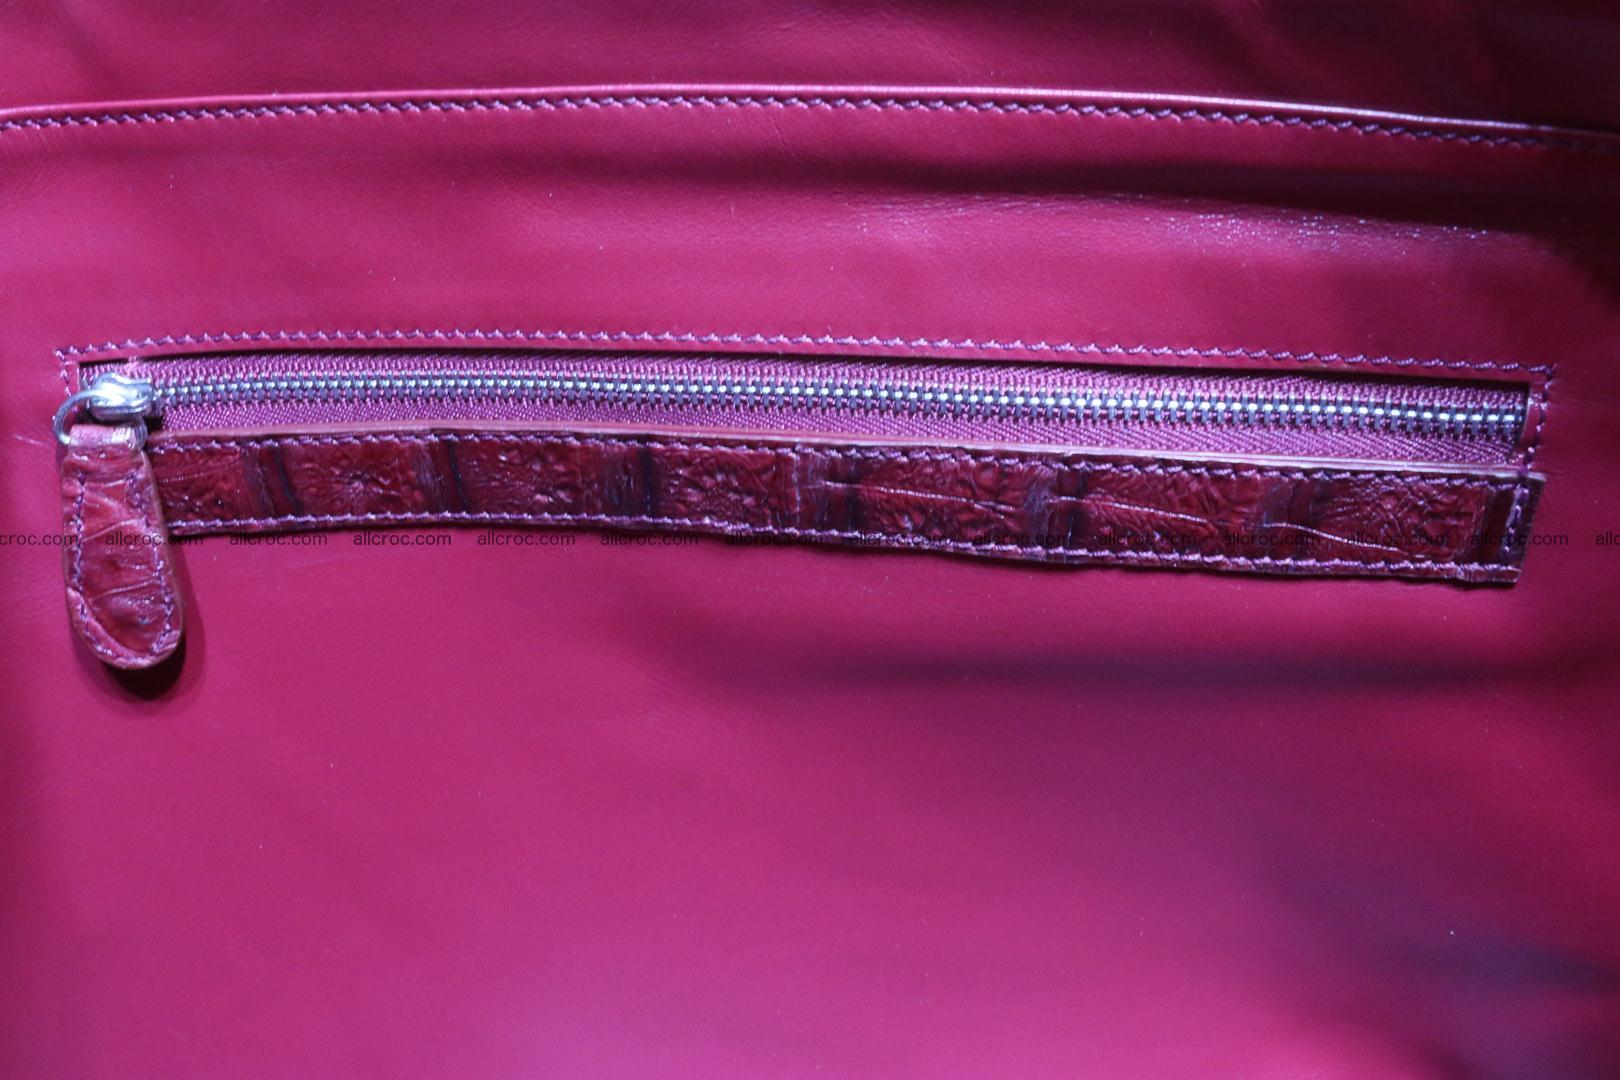 Genuine crocodile leather women's bag 063 Foto 13